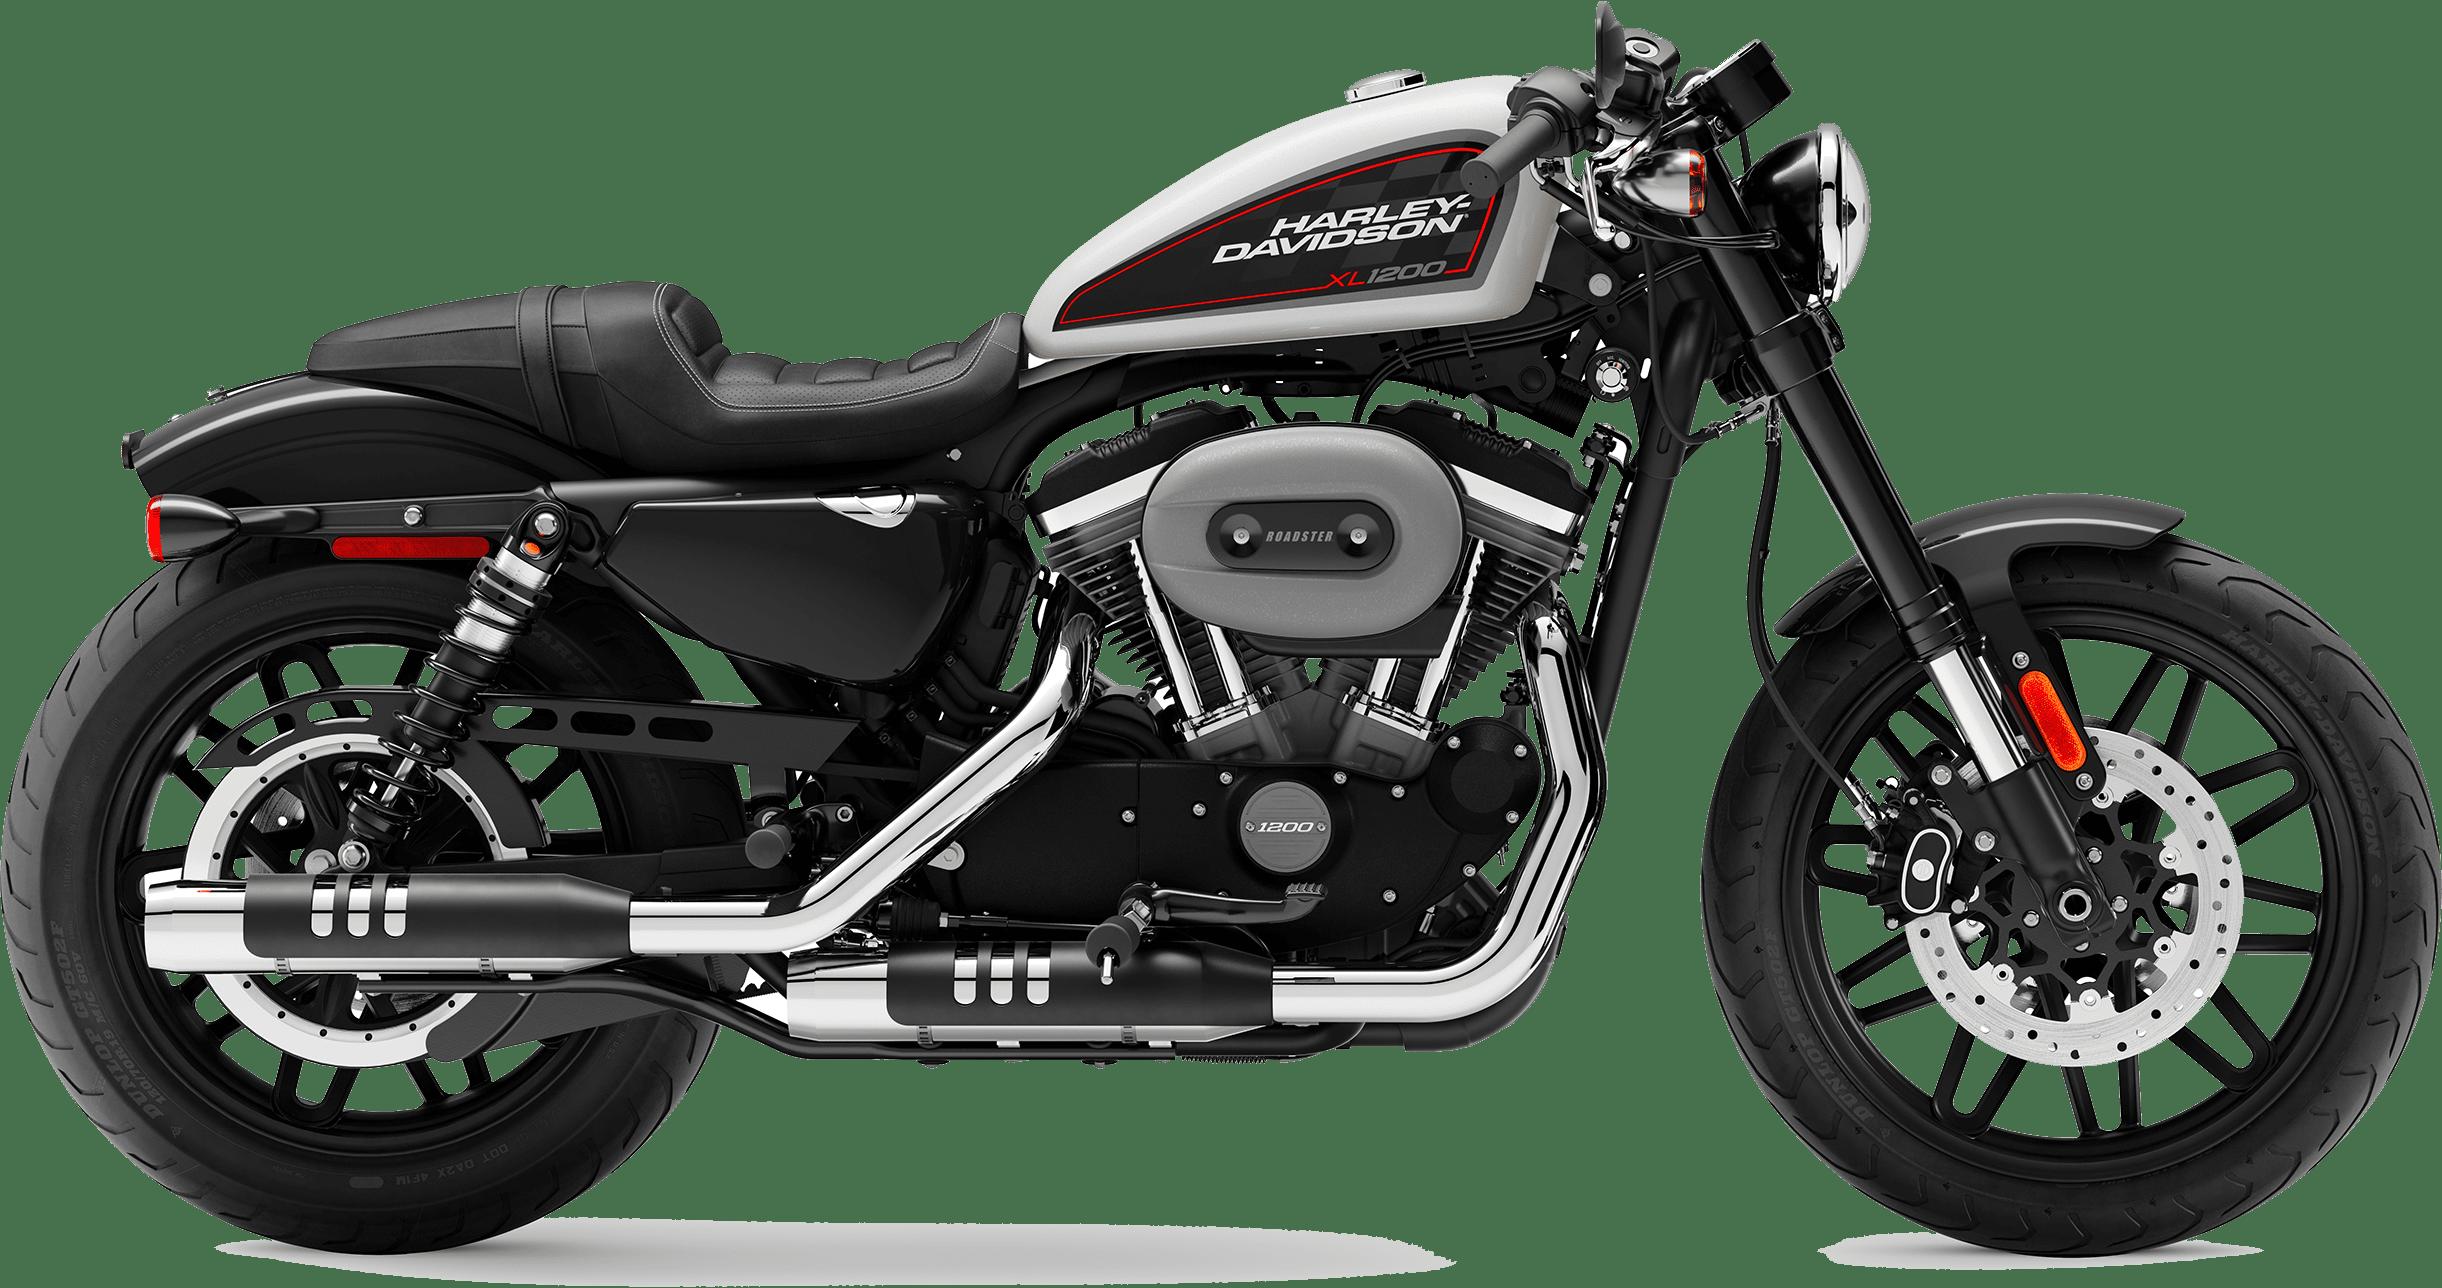 2019 Harley-Davidson H-D Sportster Roadster Billiard White